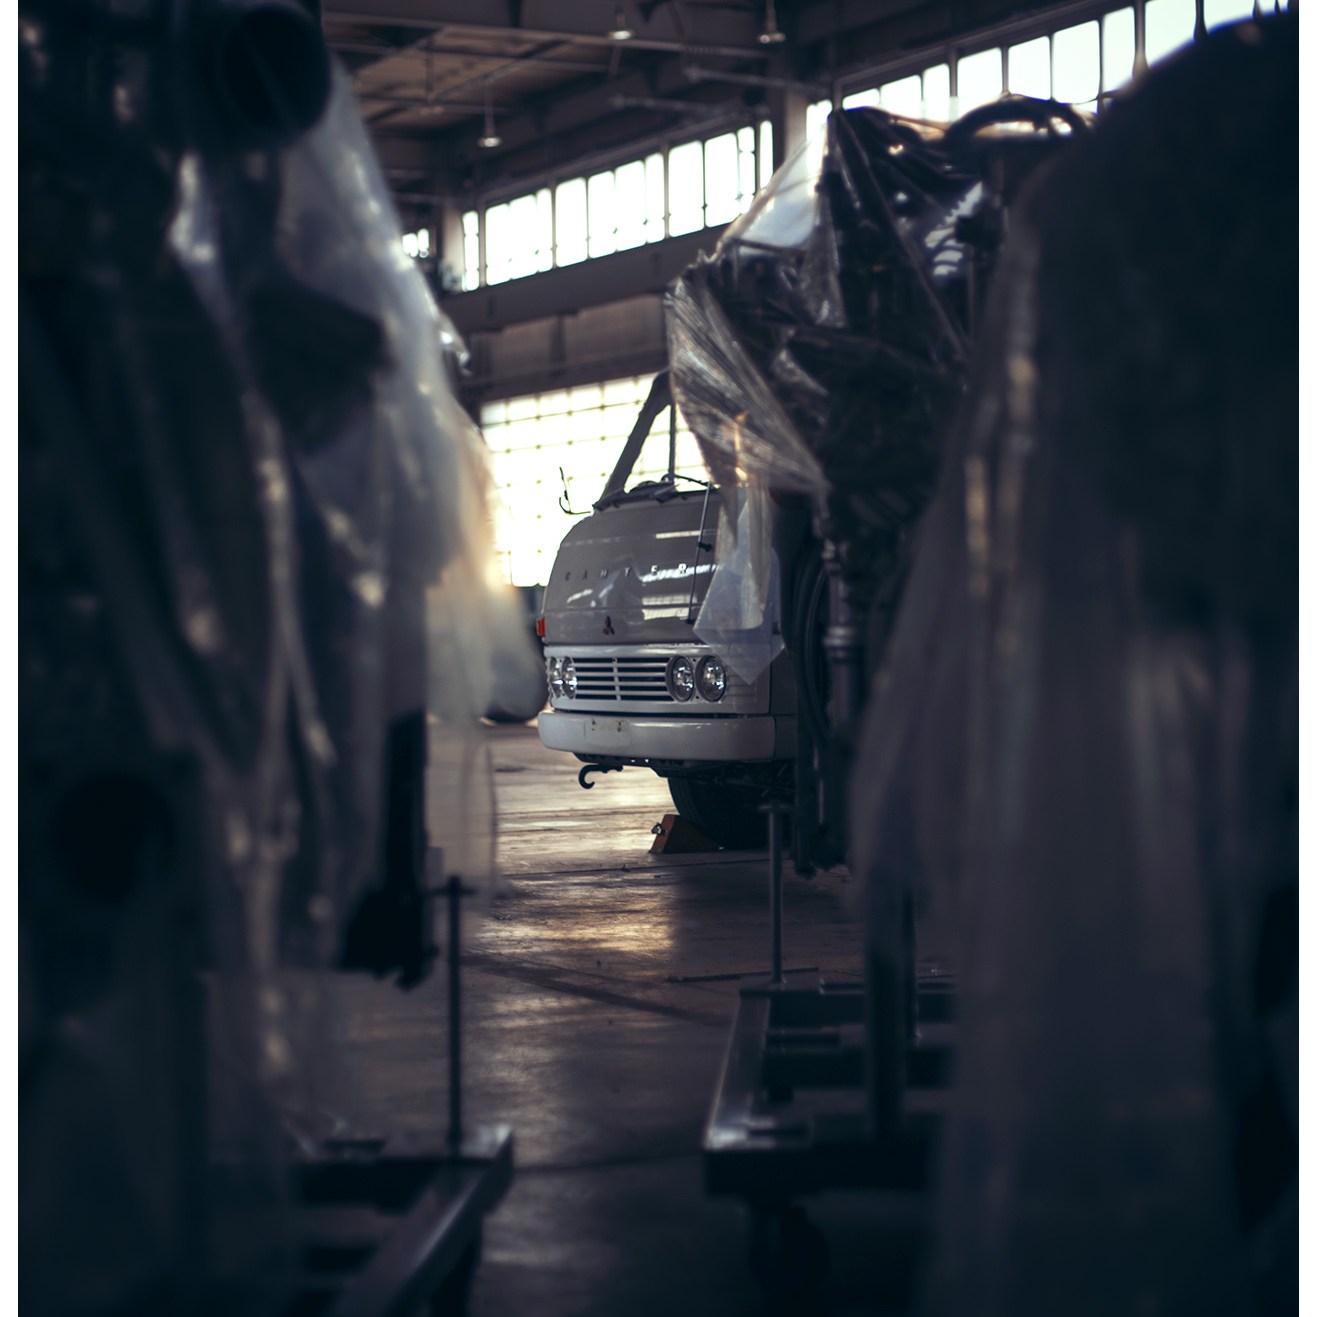 Shooting Mitsubishi-Fuso's heritage truck collection